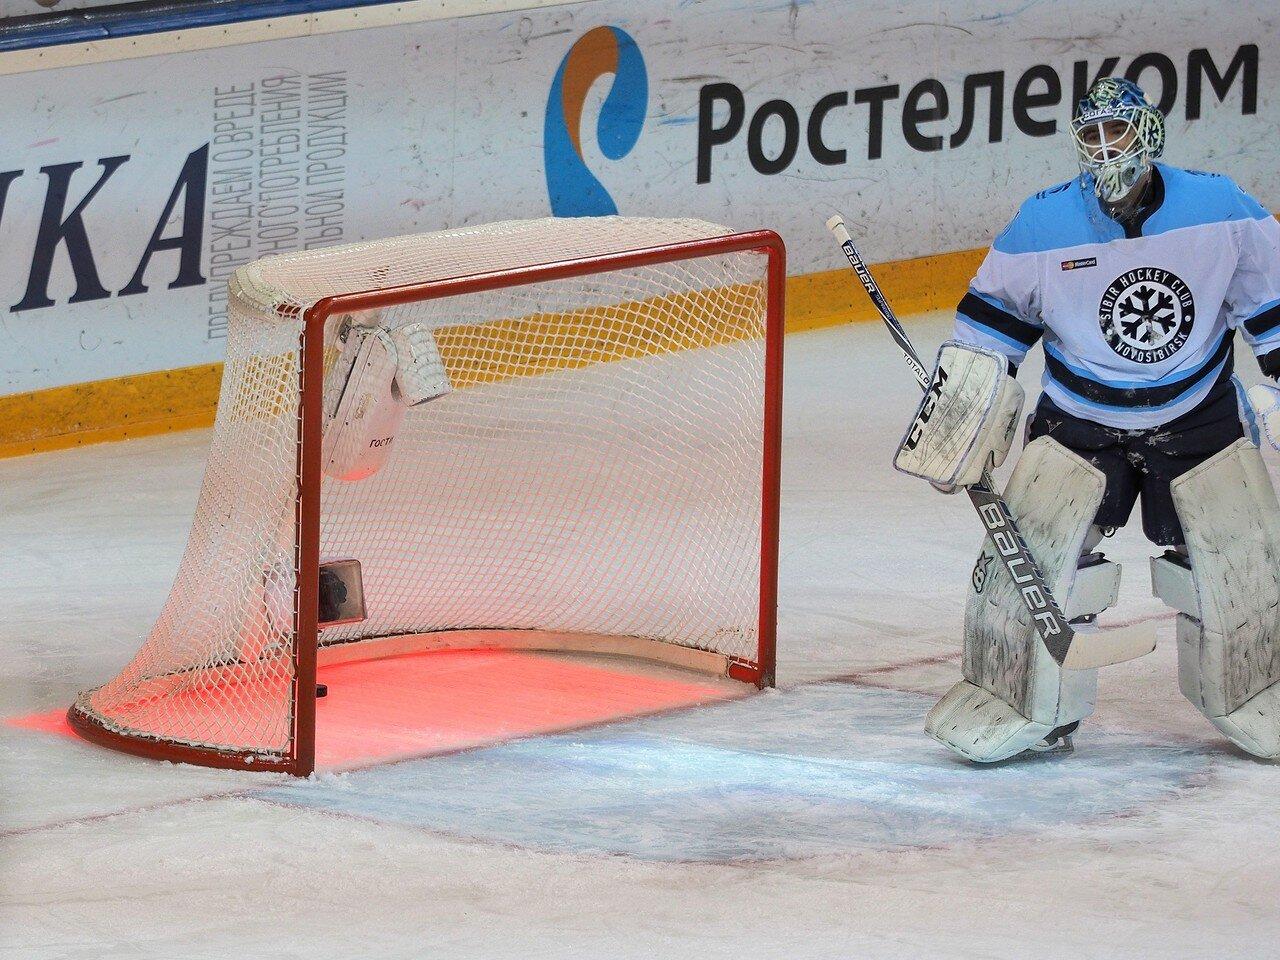 51Плей-офф 2016 Восток 1/2 Металлург - Сибирь 16.03.2016